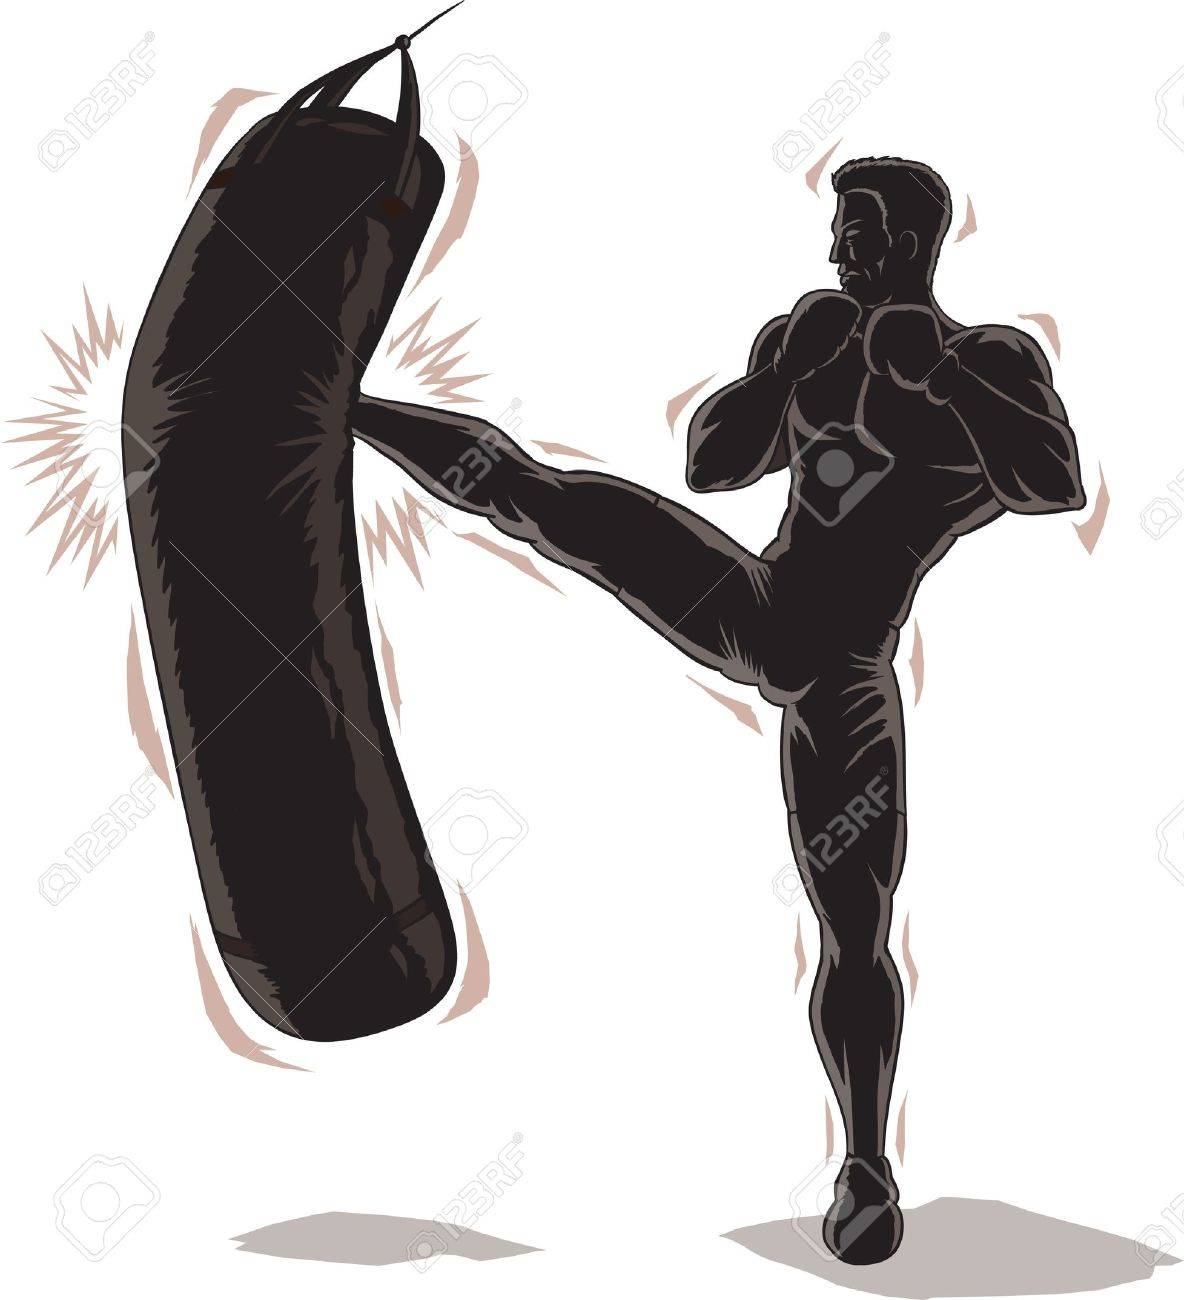 Male Kickboxer Outline - 21697952